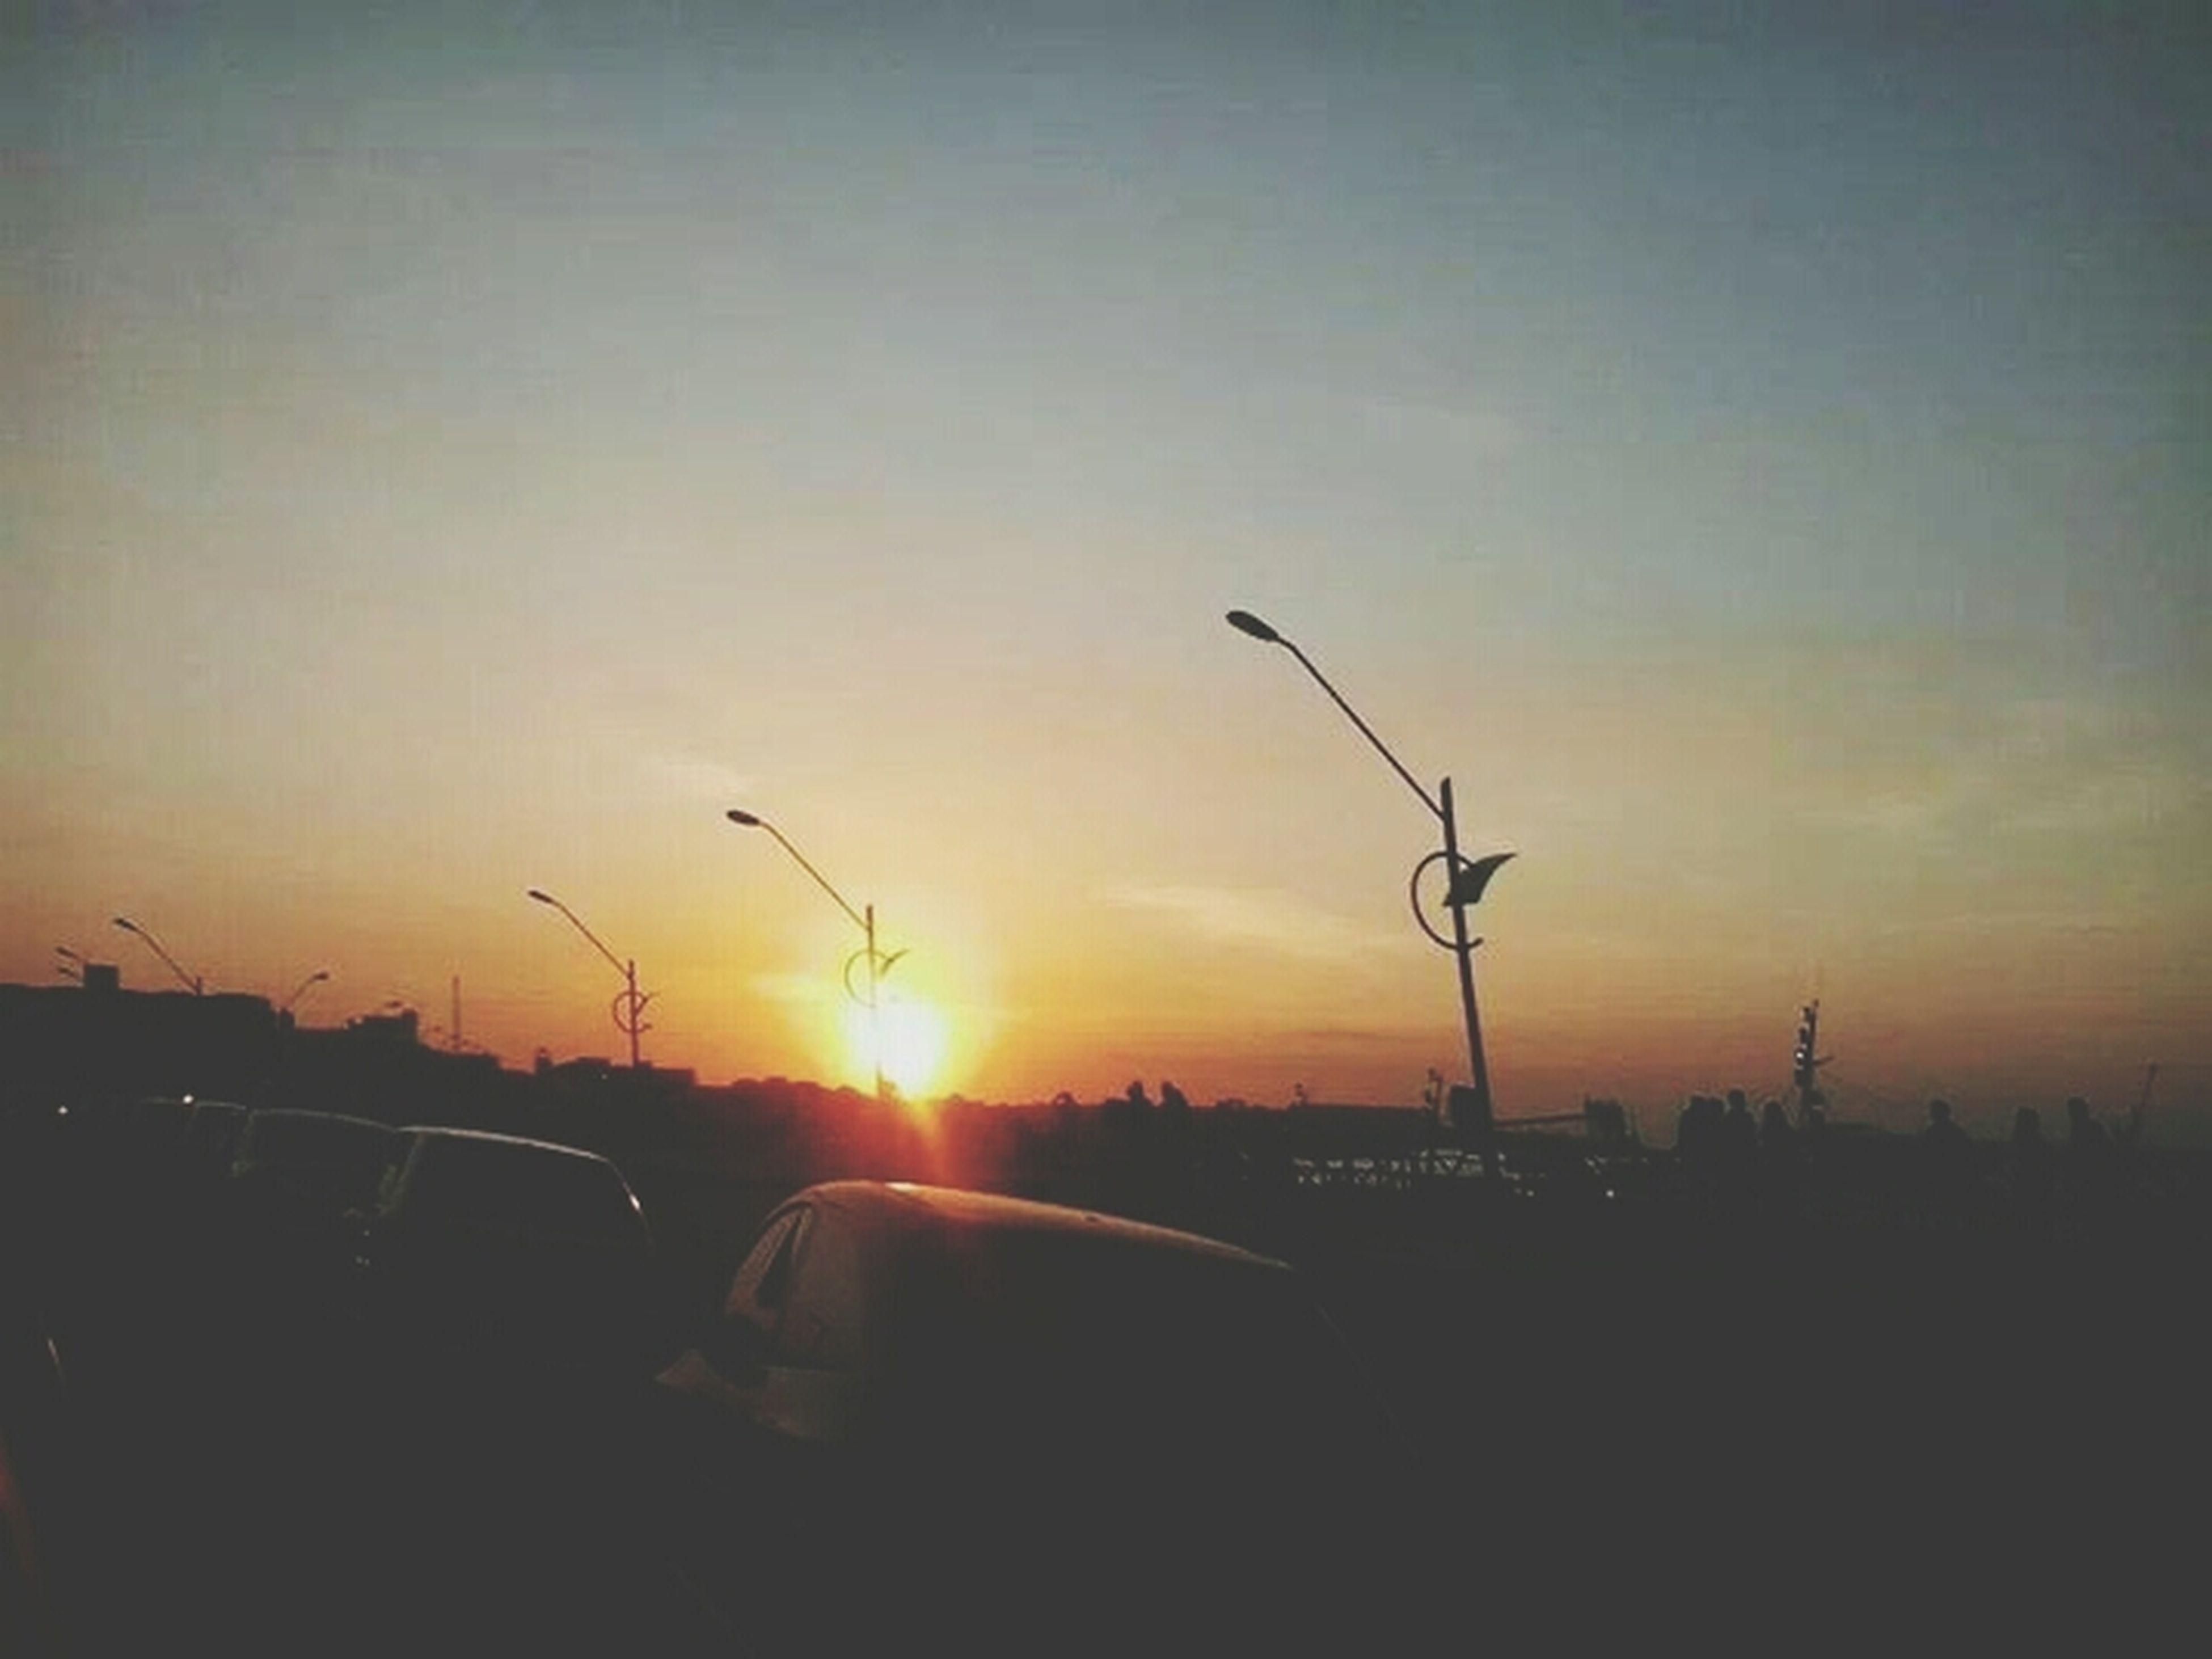 sunset, sun, silhouette, orange color, transportation, sky, car, sunlight, mode of transport, nature, sunbeam, beauty in nature, land vehicle, scenics, bird, flying, lens flare, outdoors, street light, tranquil scene